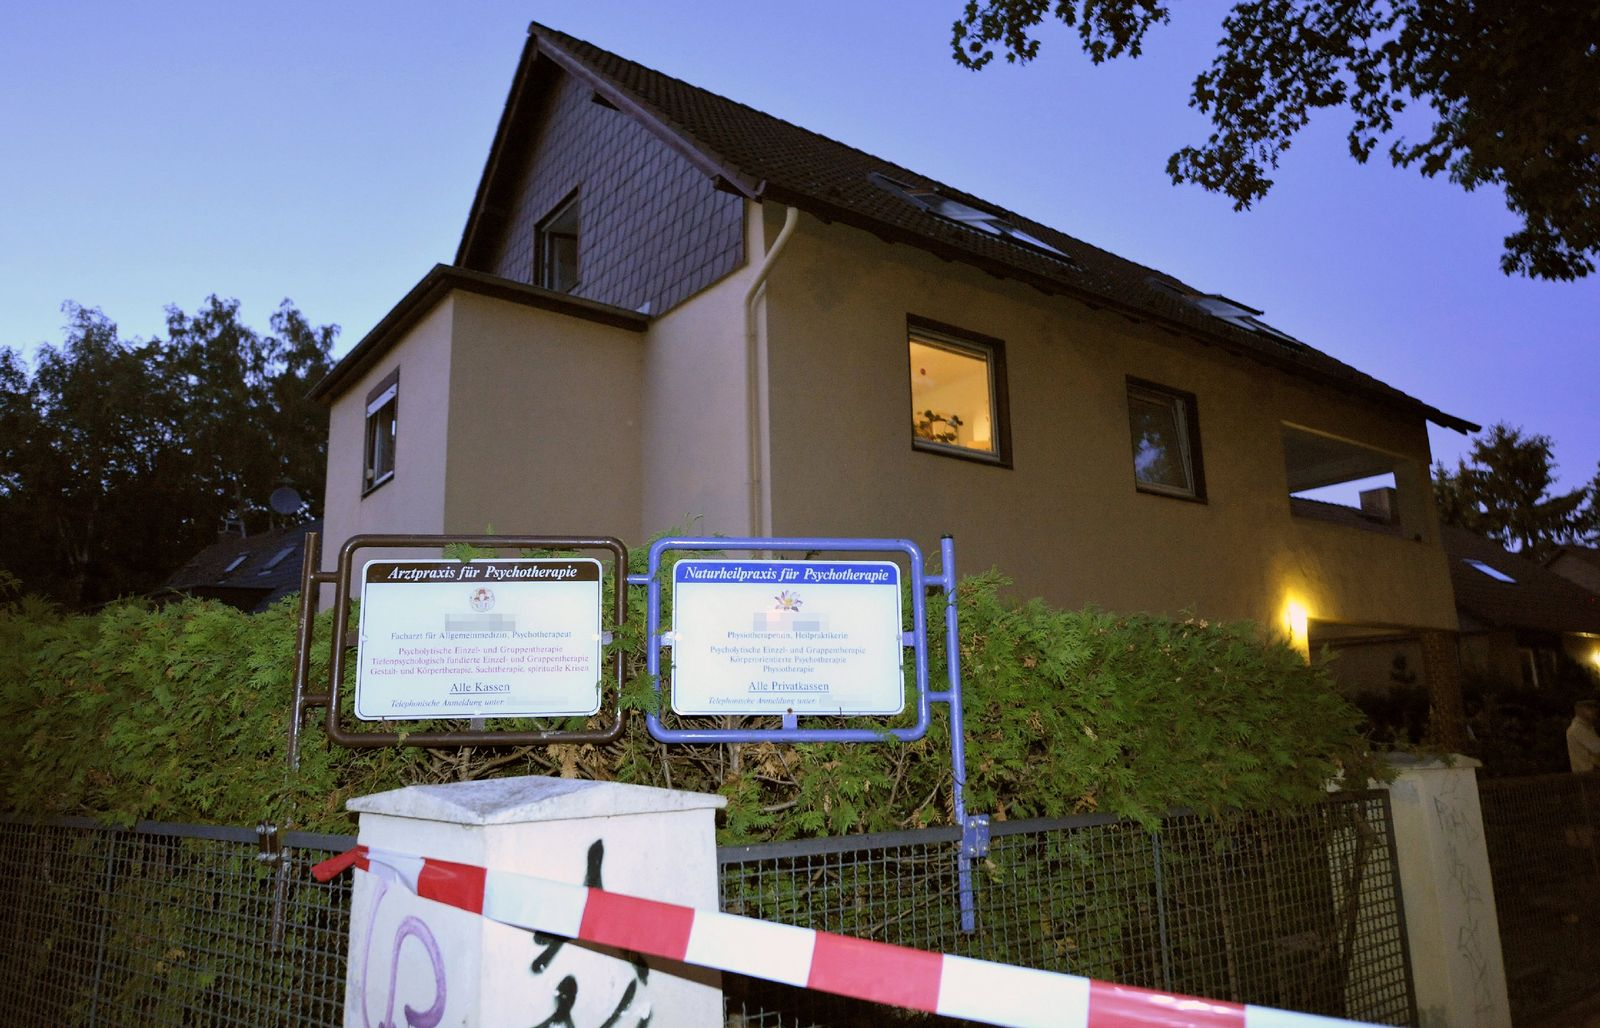 Berlin / Hermsdorf / Gruppentherapie / Vergiftung